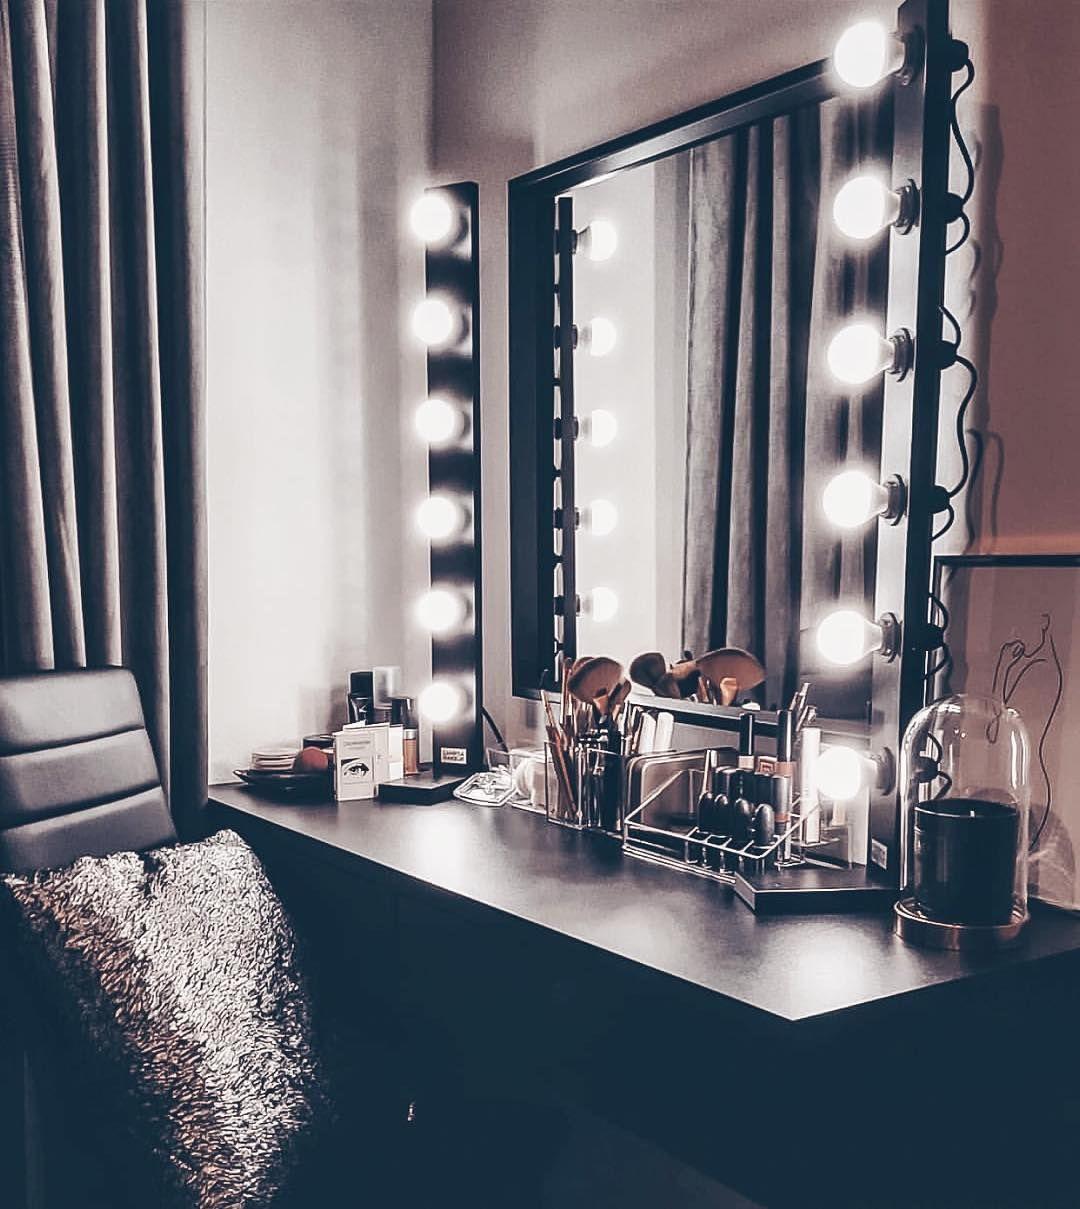 Makeup Lighting For Vanity On